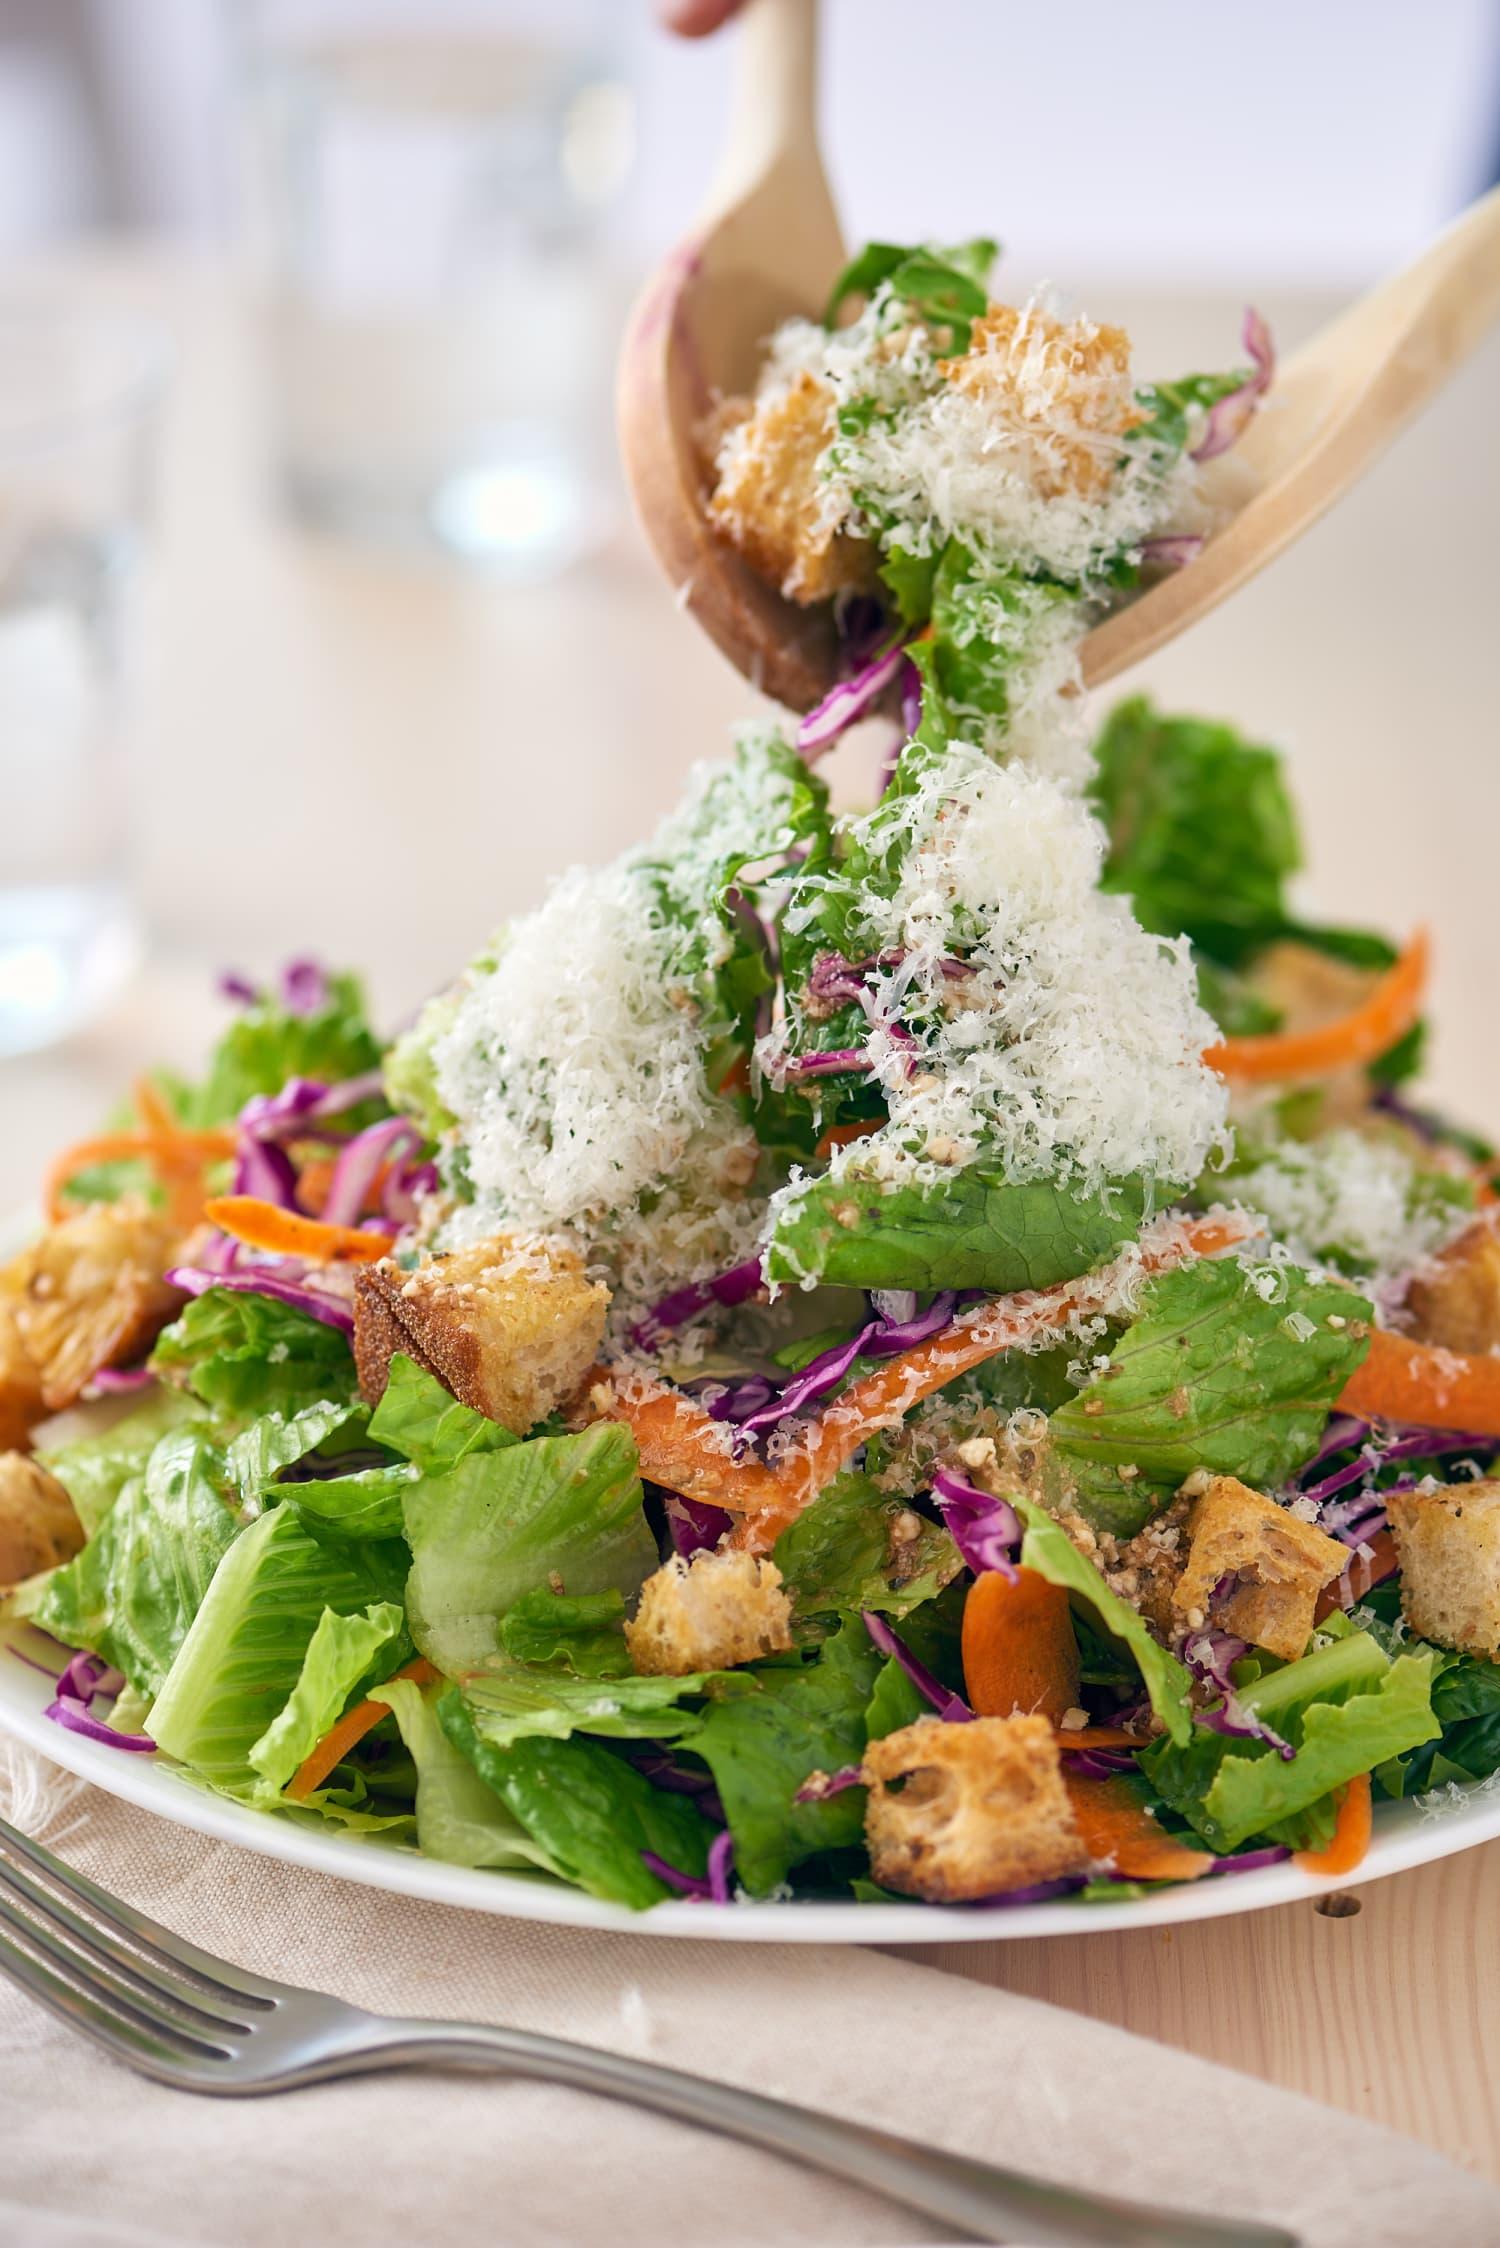 Recipe: Jersey Salad